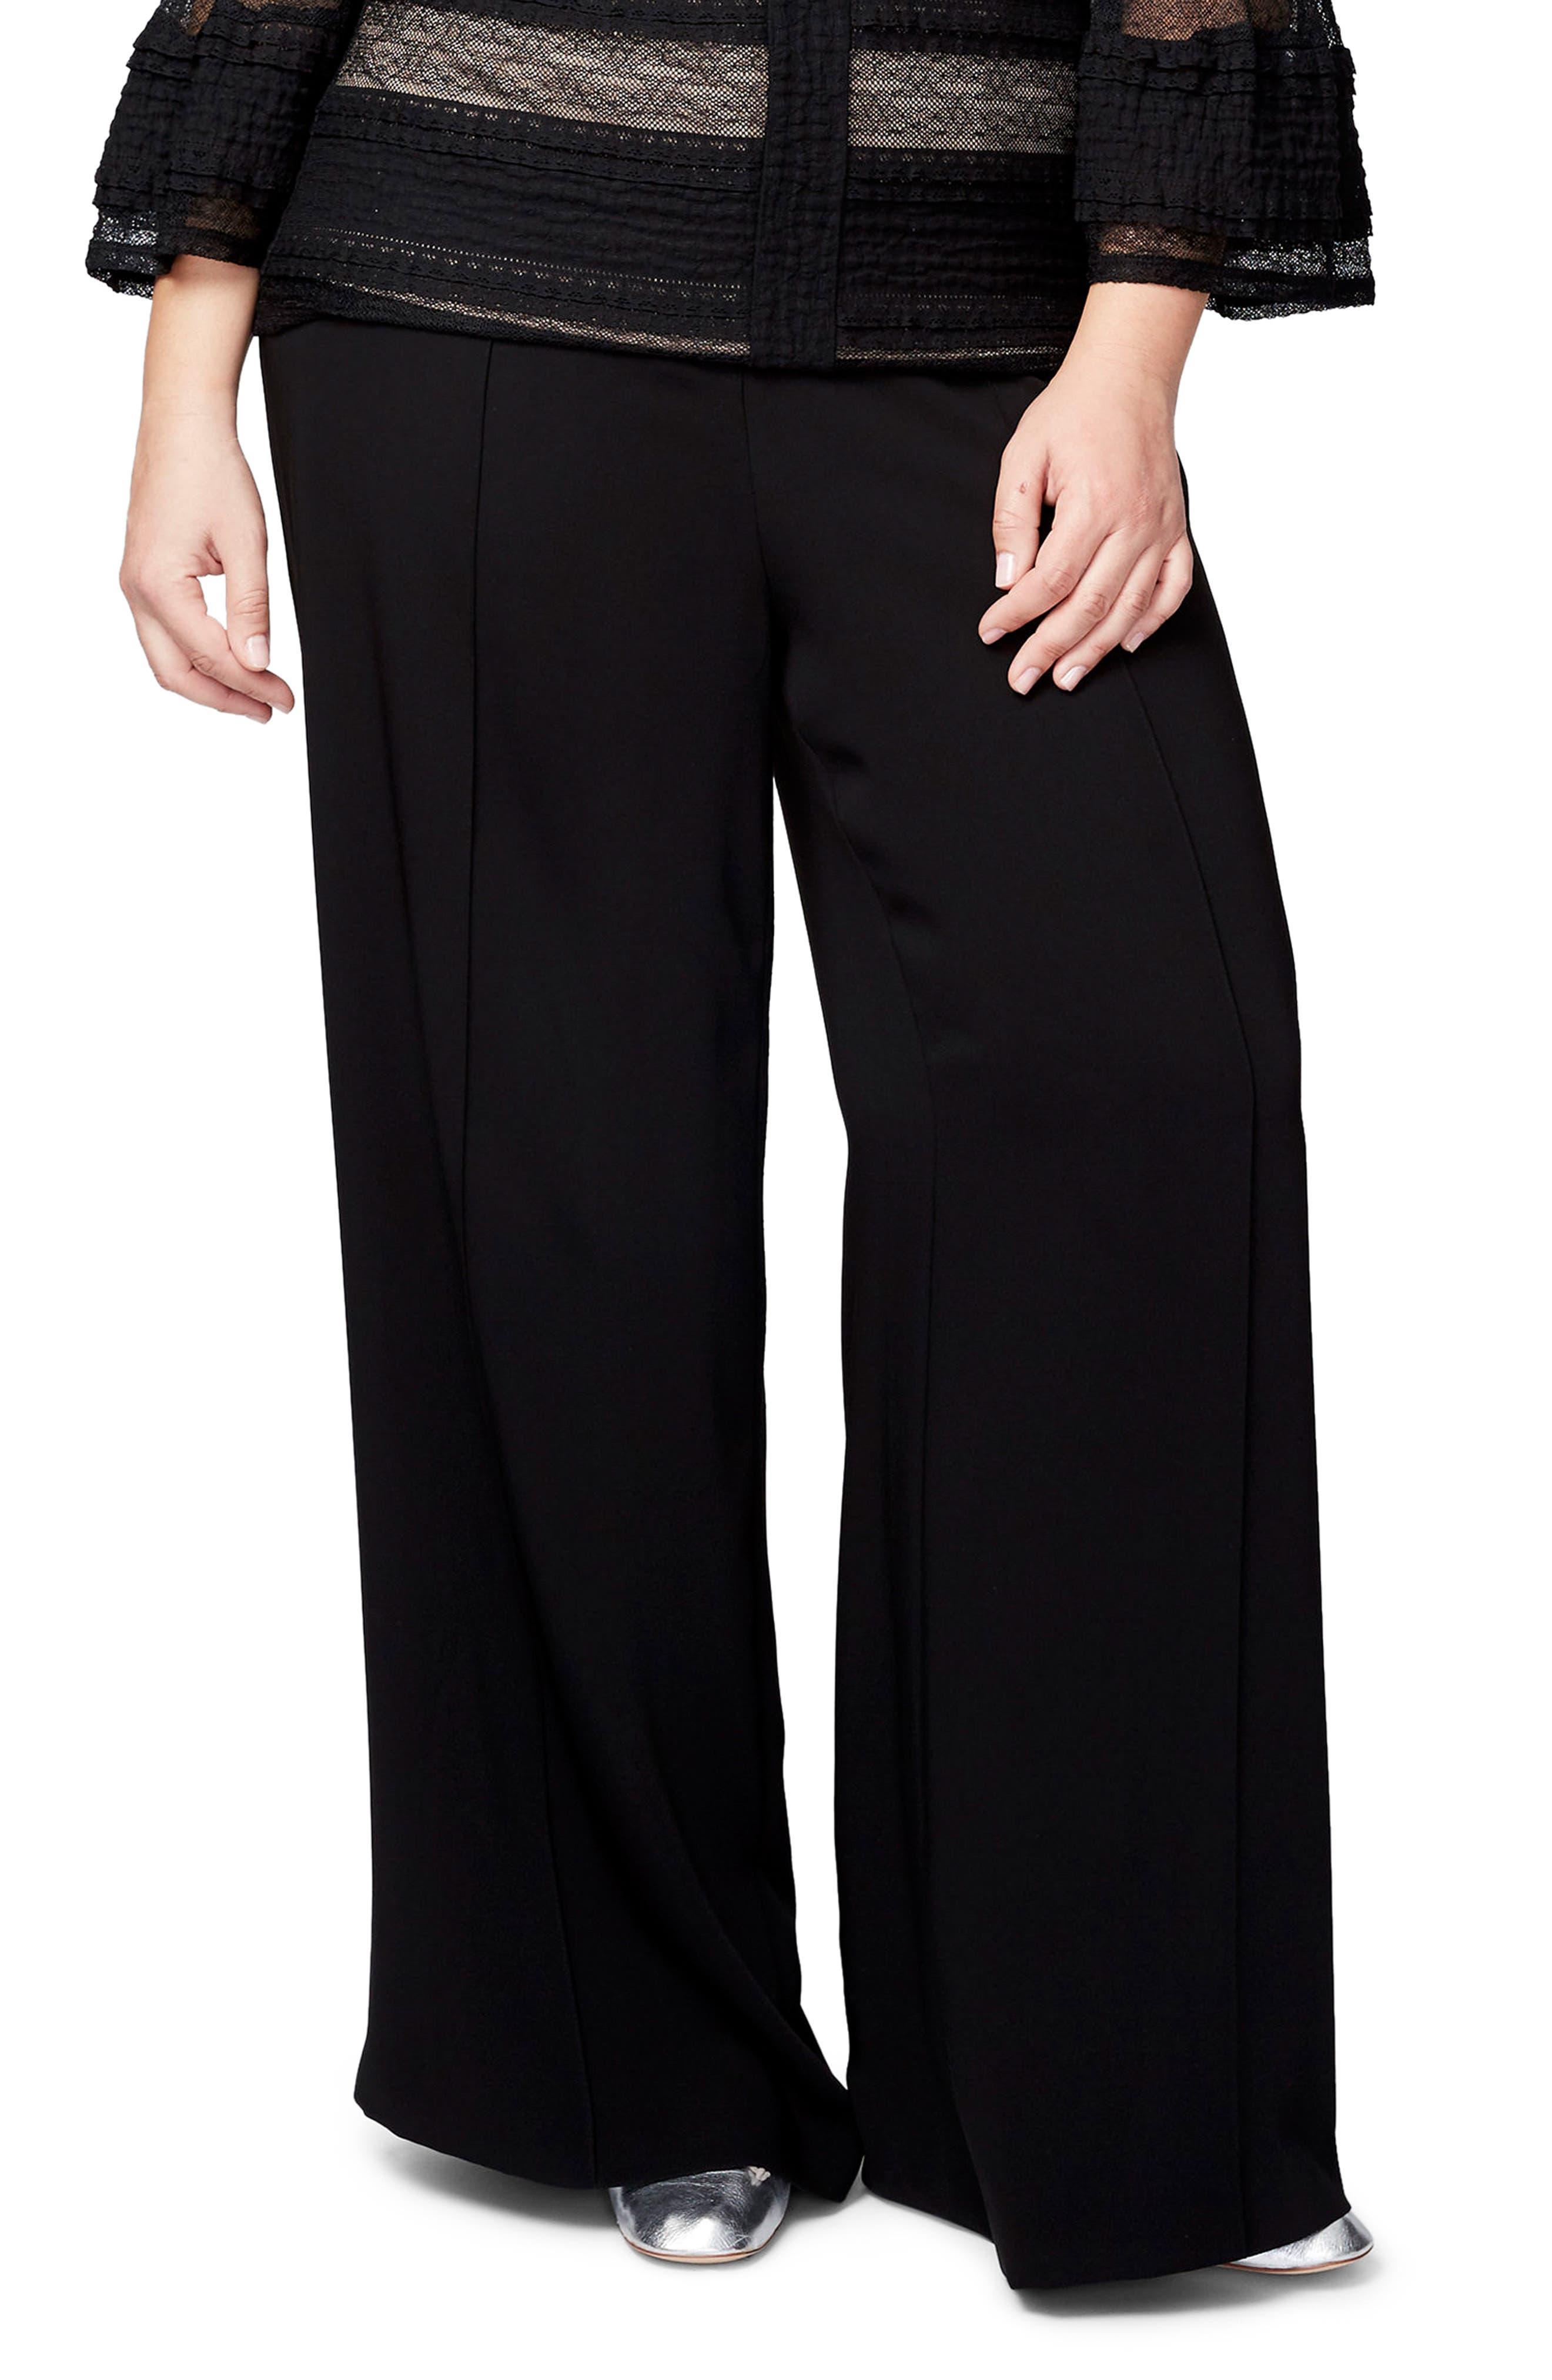 RACHEL Rachel Roy Denise Wide Leg Pants (Plus Size)